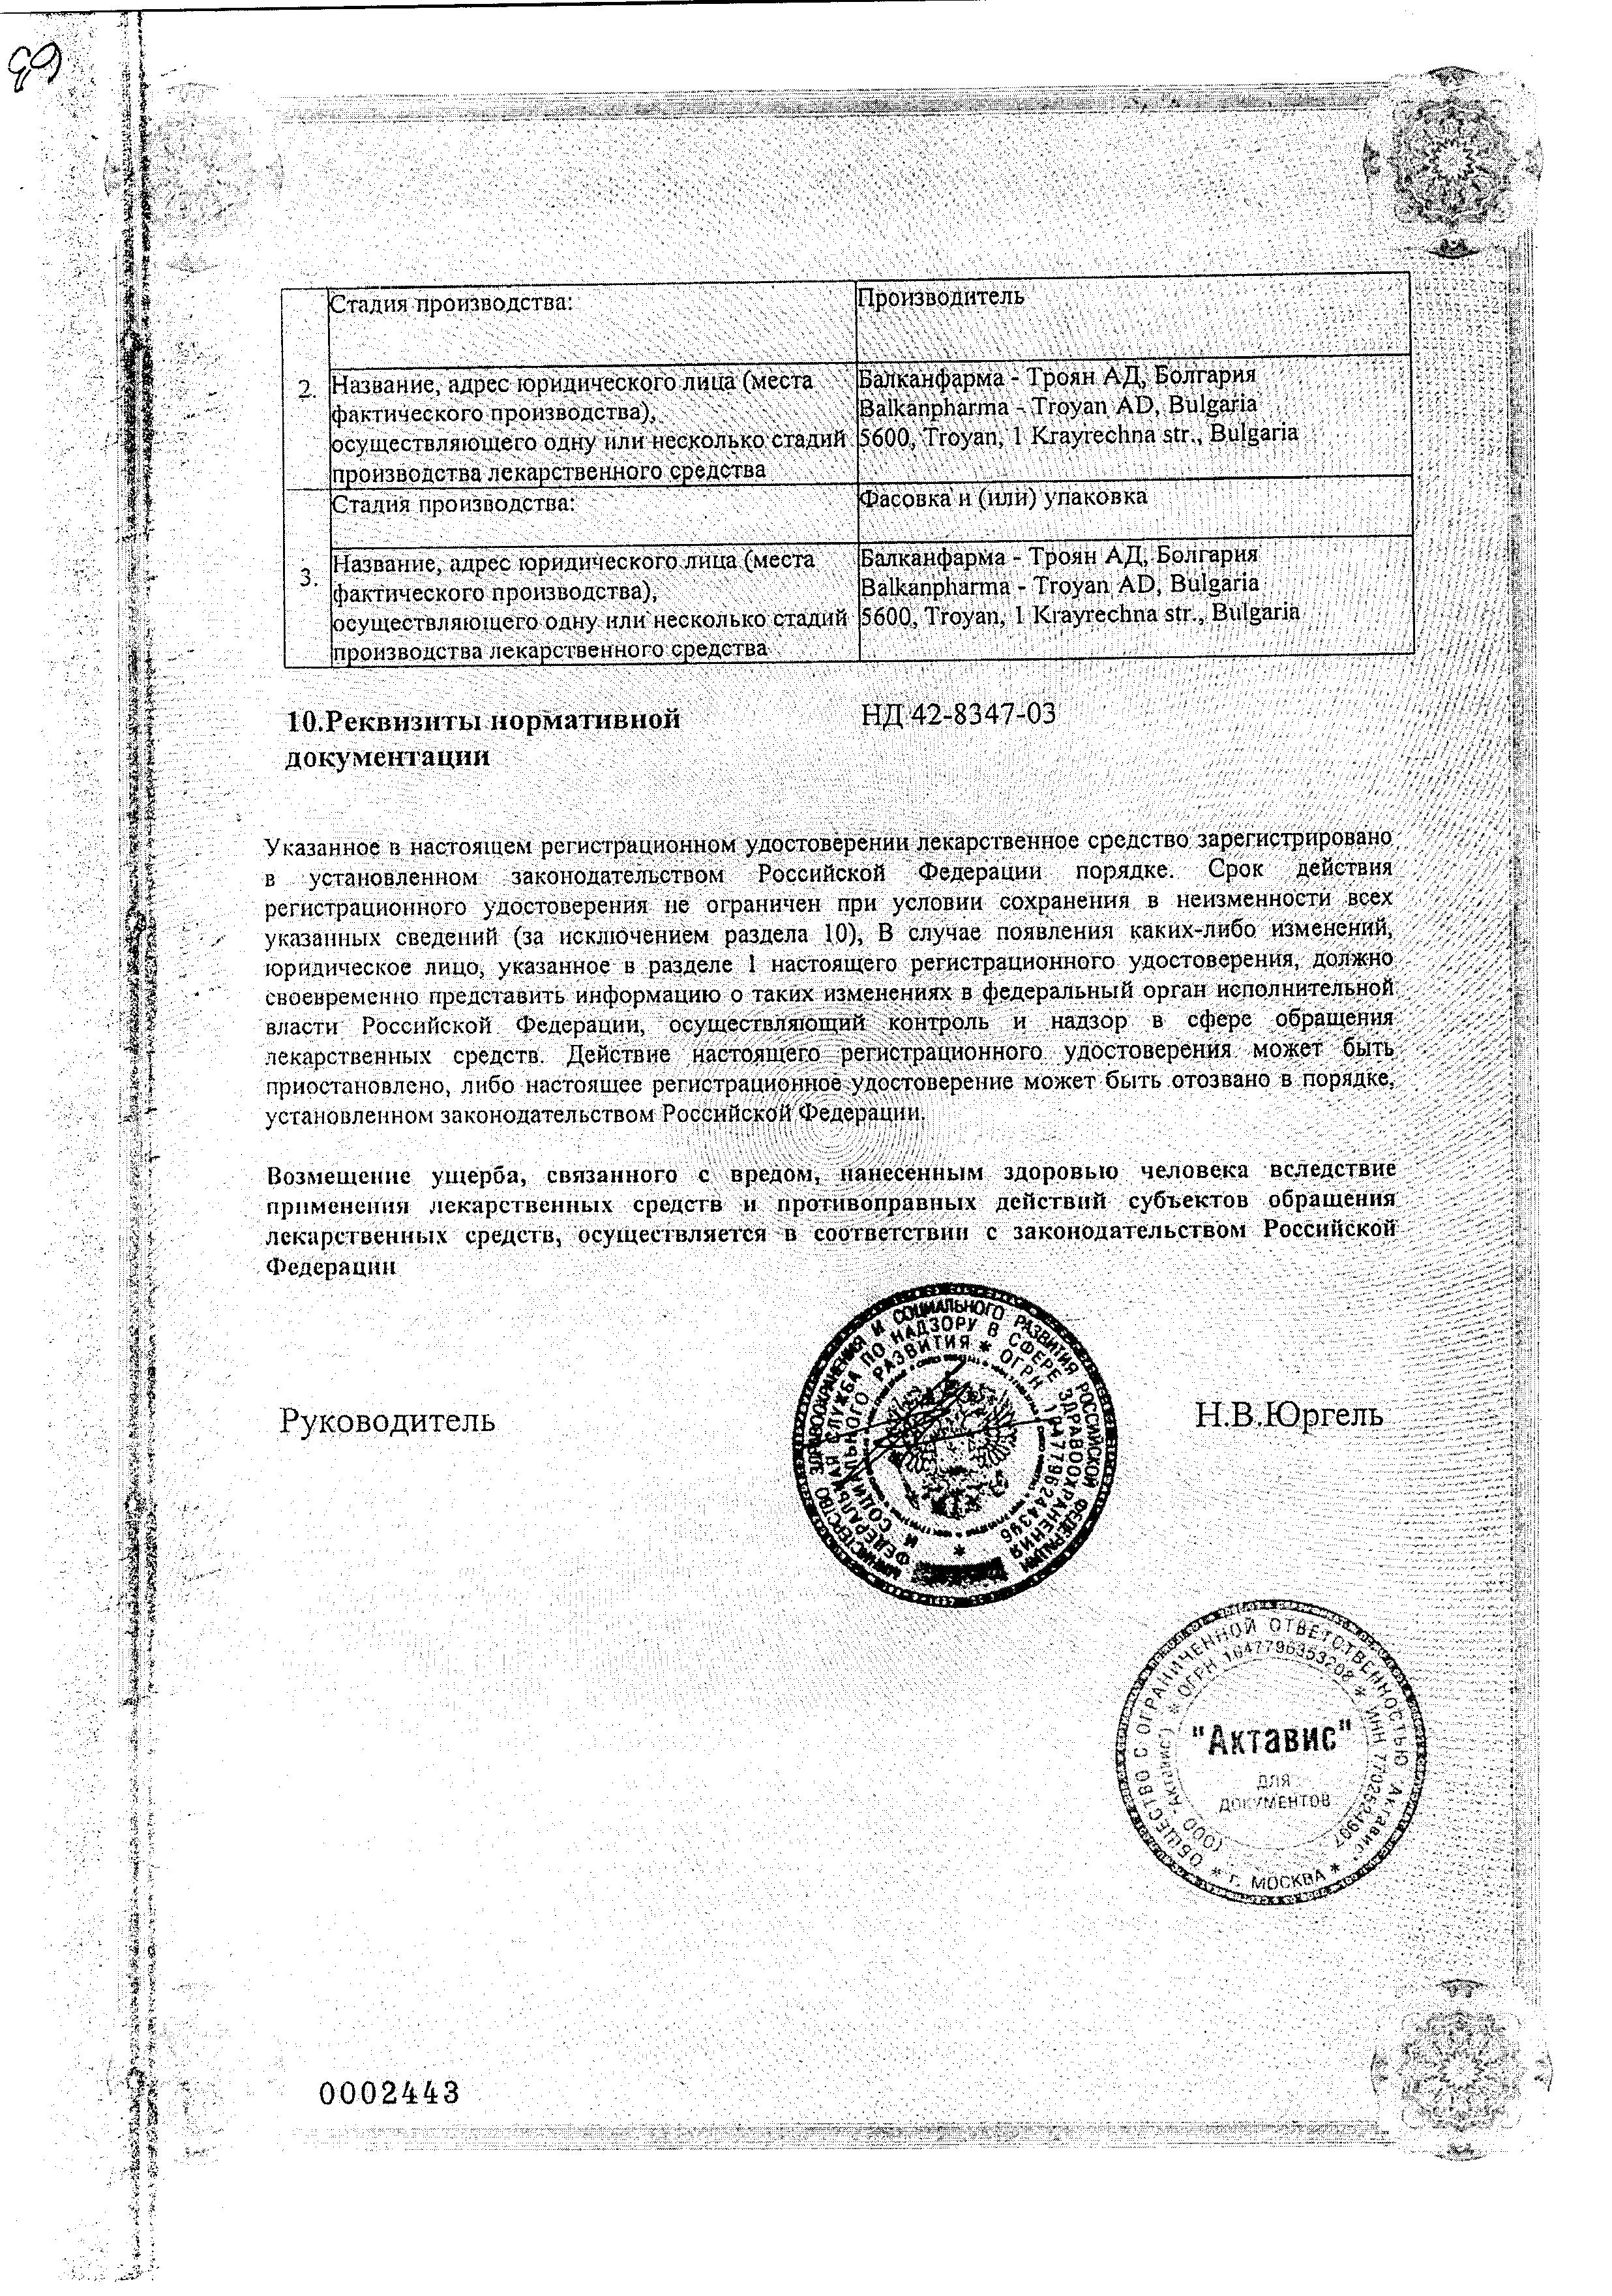 Индовазин сертификат